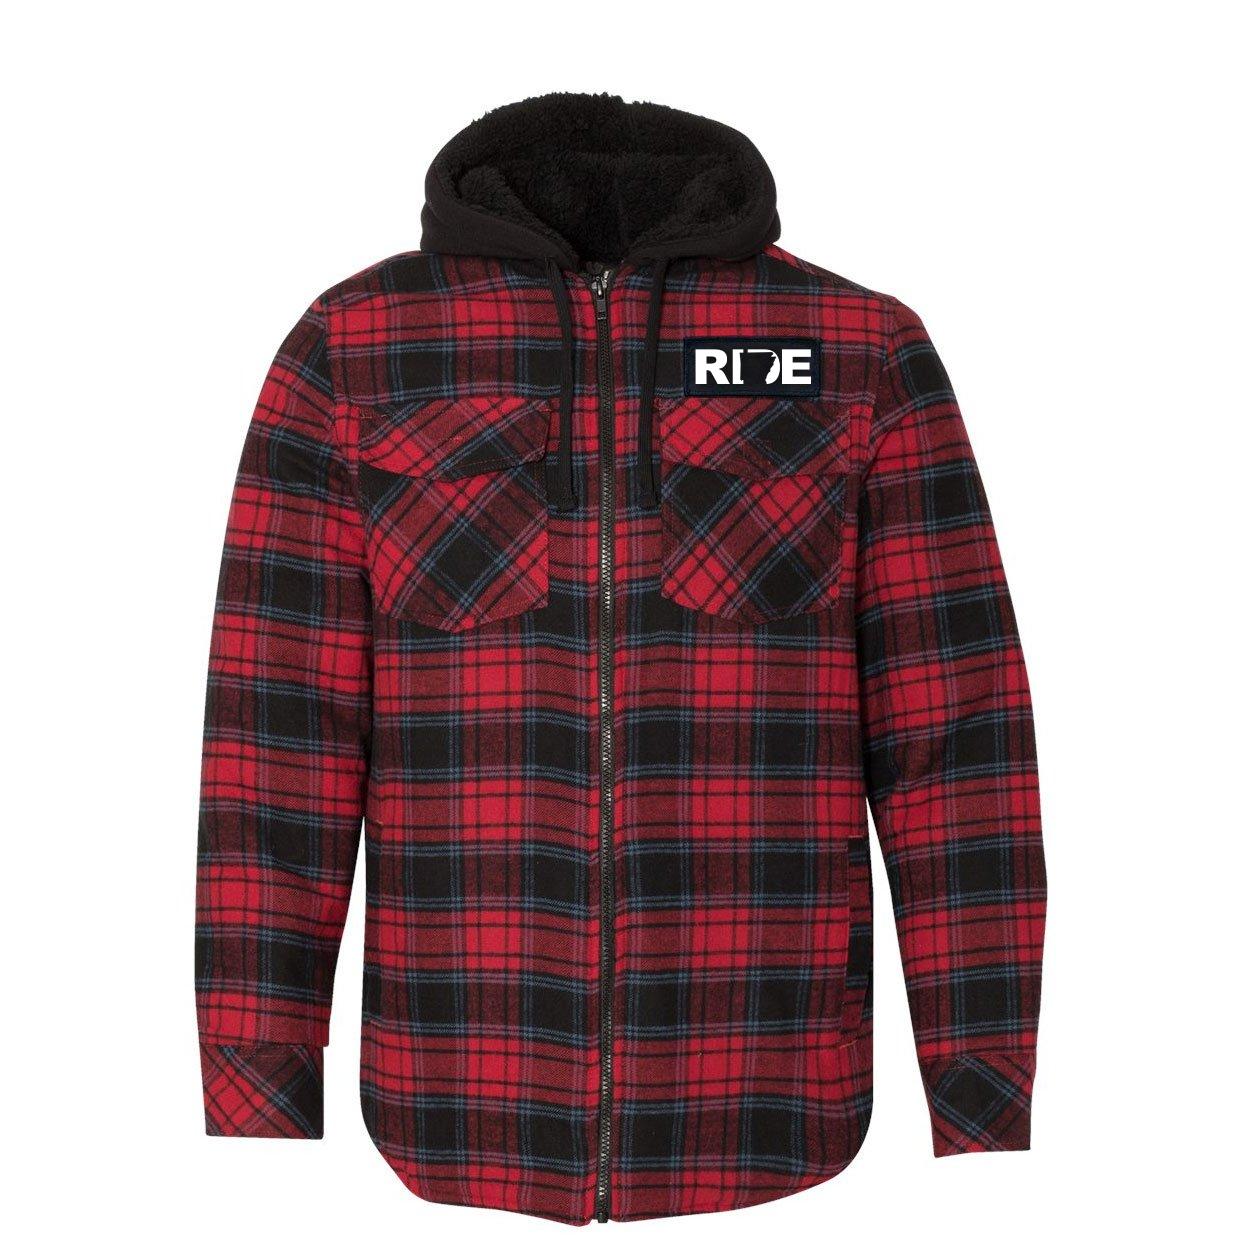 Ride Arkansas Classic Unisex Full Zip Woven Patch Hooded Flannel Jacket Red/Black Buffalo (White Logo)